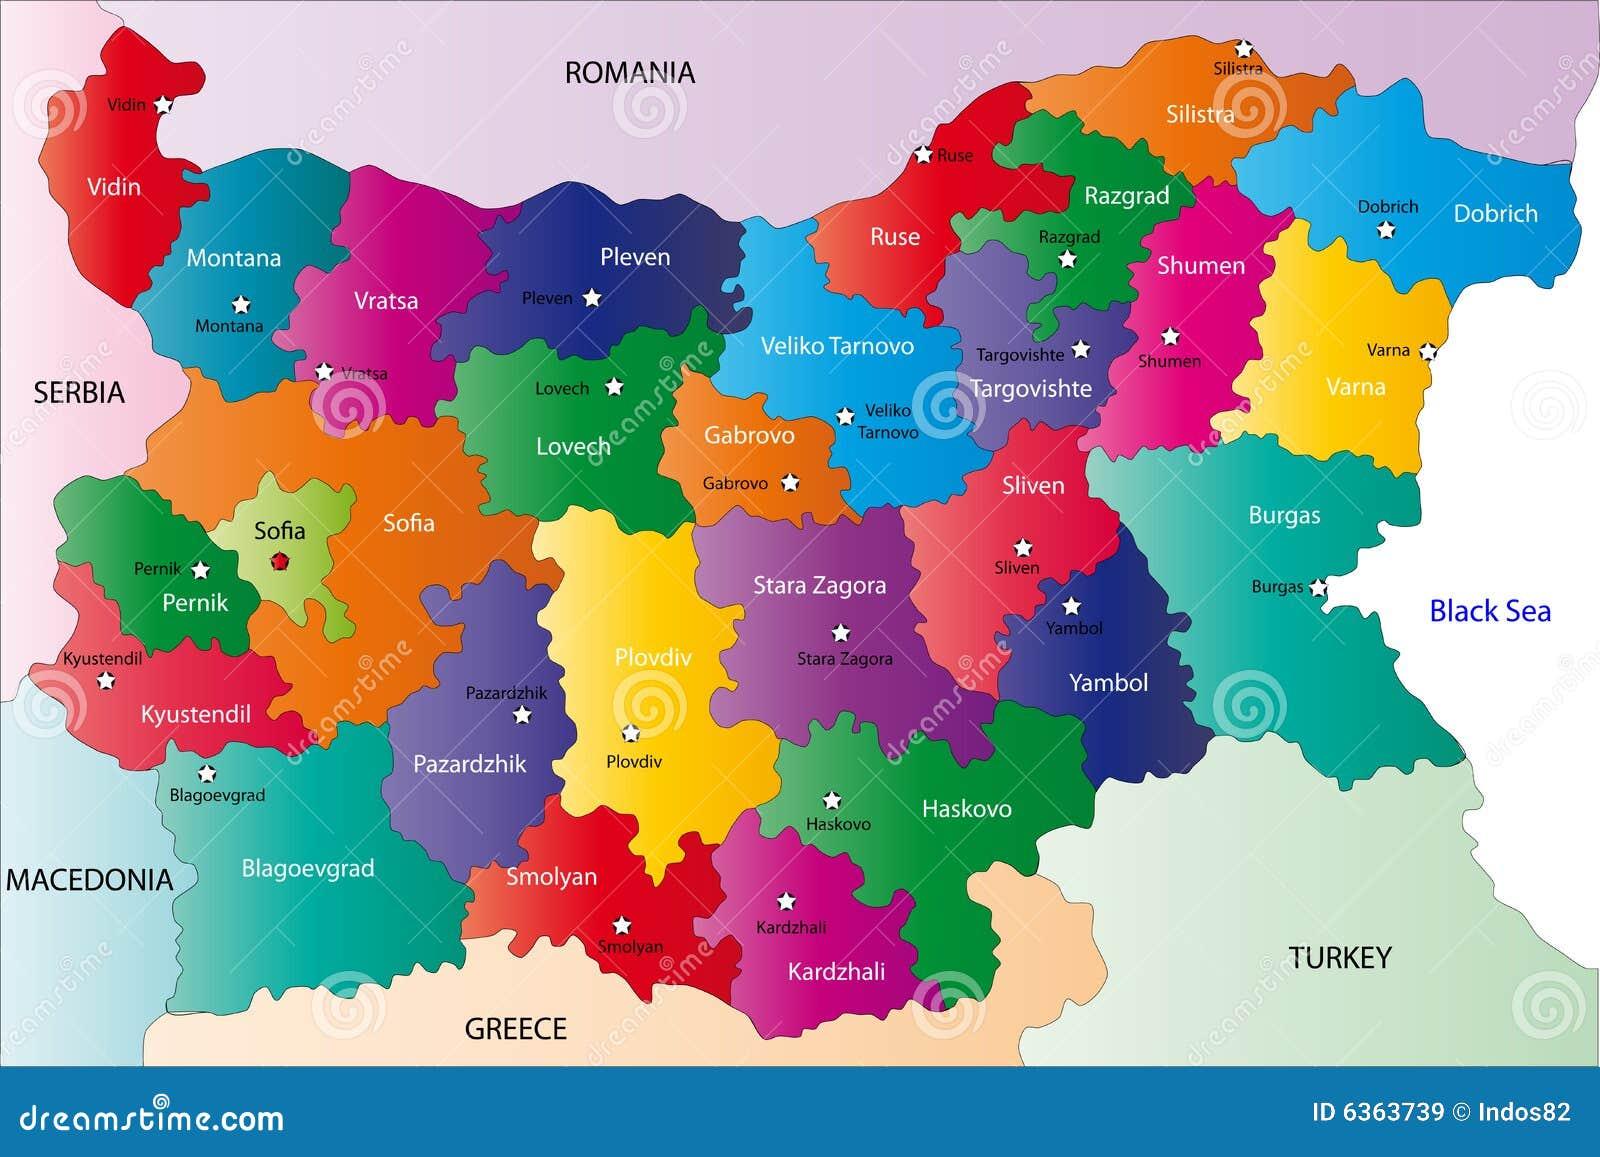 Karte Bulgarien.Bulgarien Karte Vektor Abbildung Illustration Von Aqua